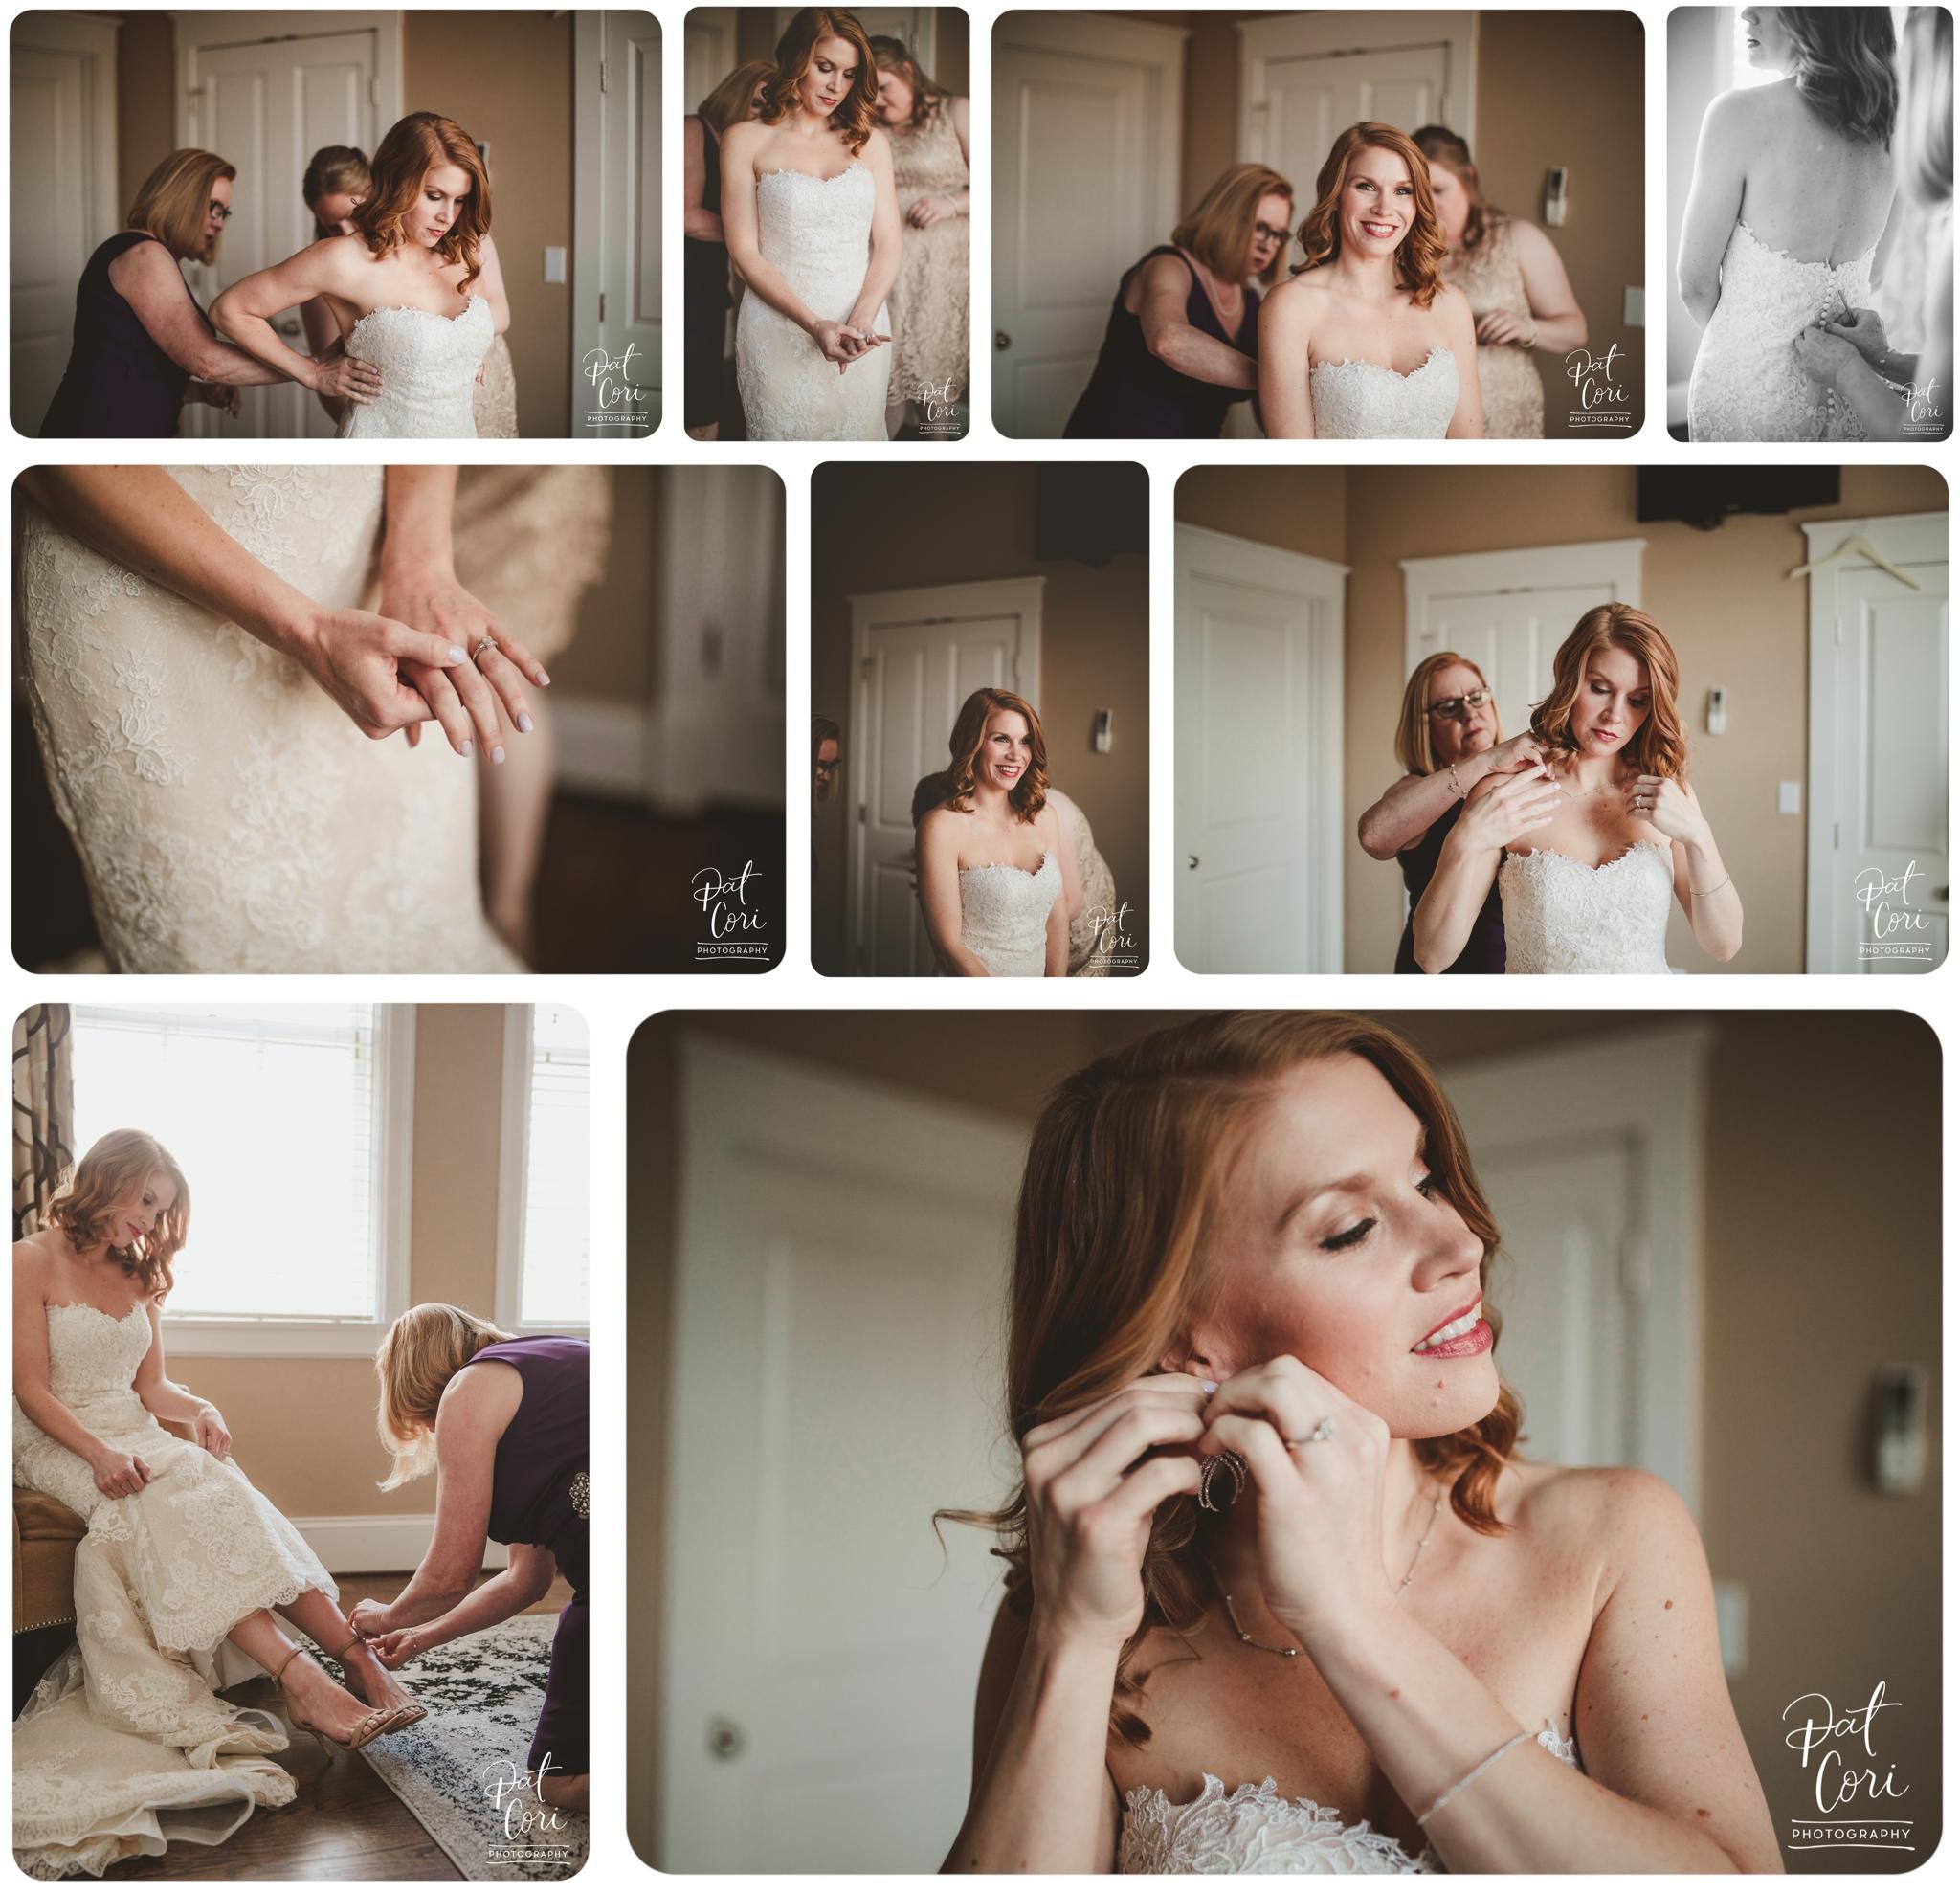 JenniferJim-Collage-03.jpg